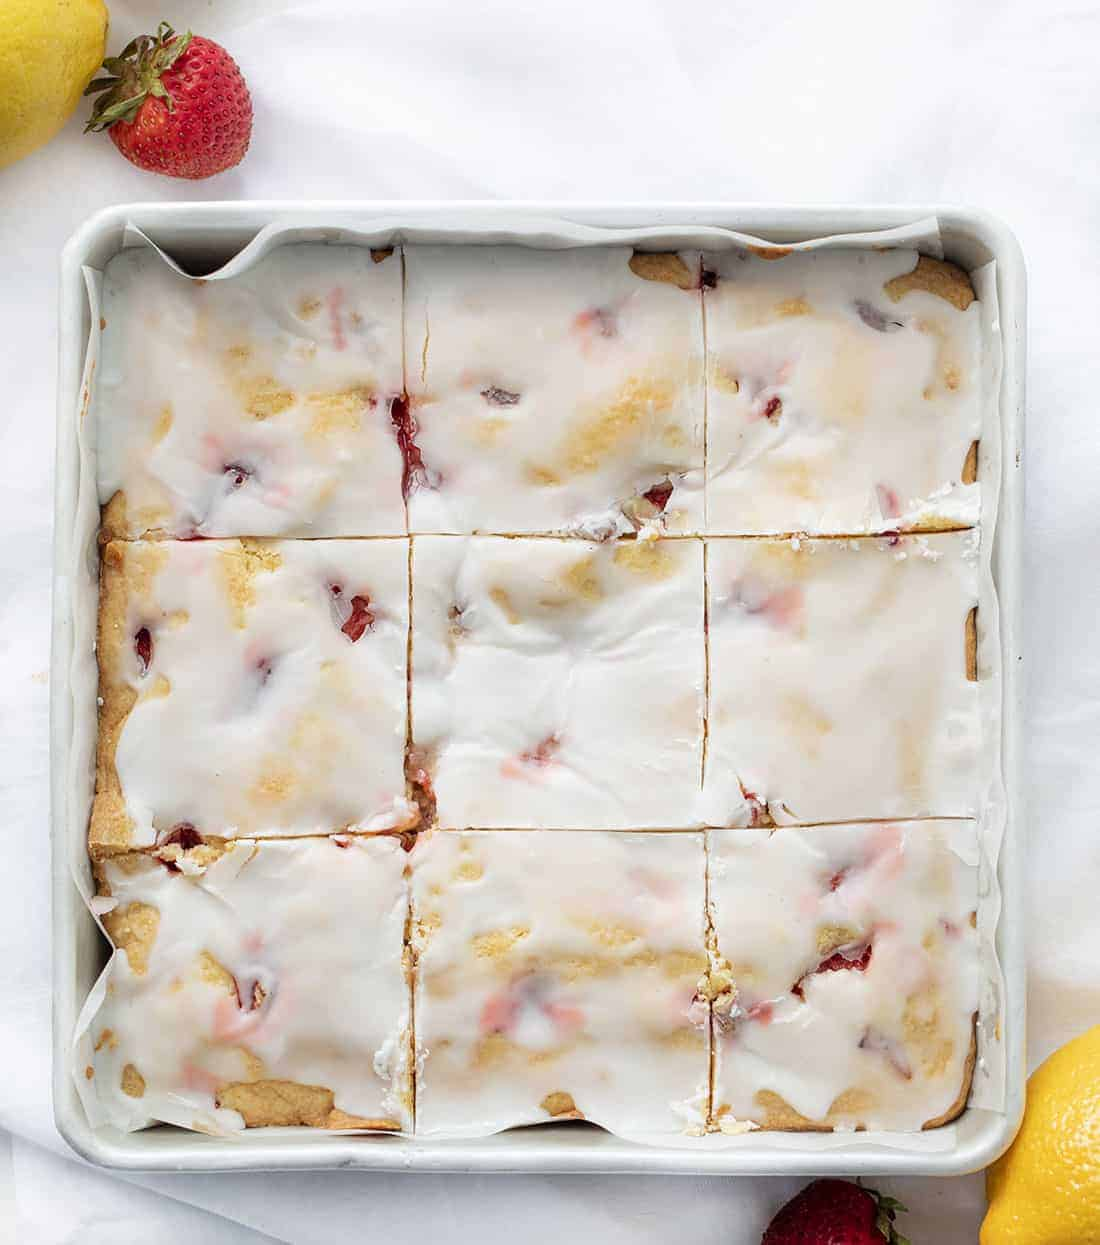 Pan of Strawberry Lemon Blondies Cut Into Squares